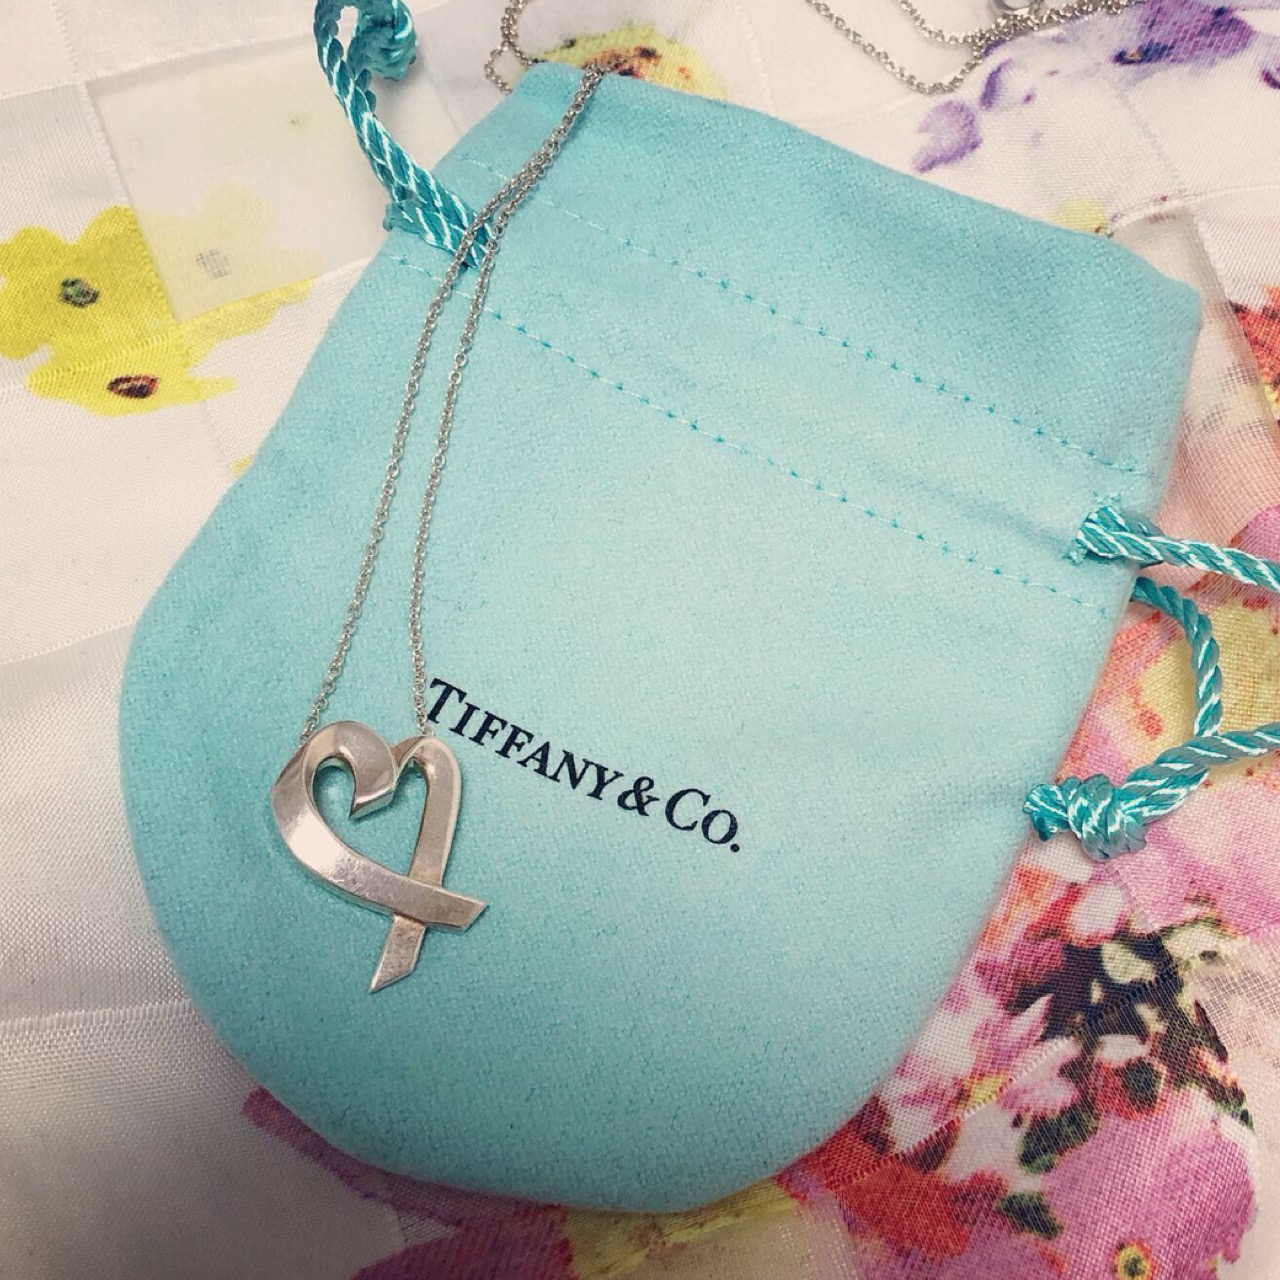 <TIFFANY&Co.>わたしがティファニーを選ぶ理由!今年の自分から自分へのバースデープレゼントは大好きなティファニー♡_5